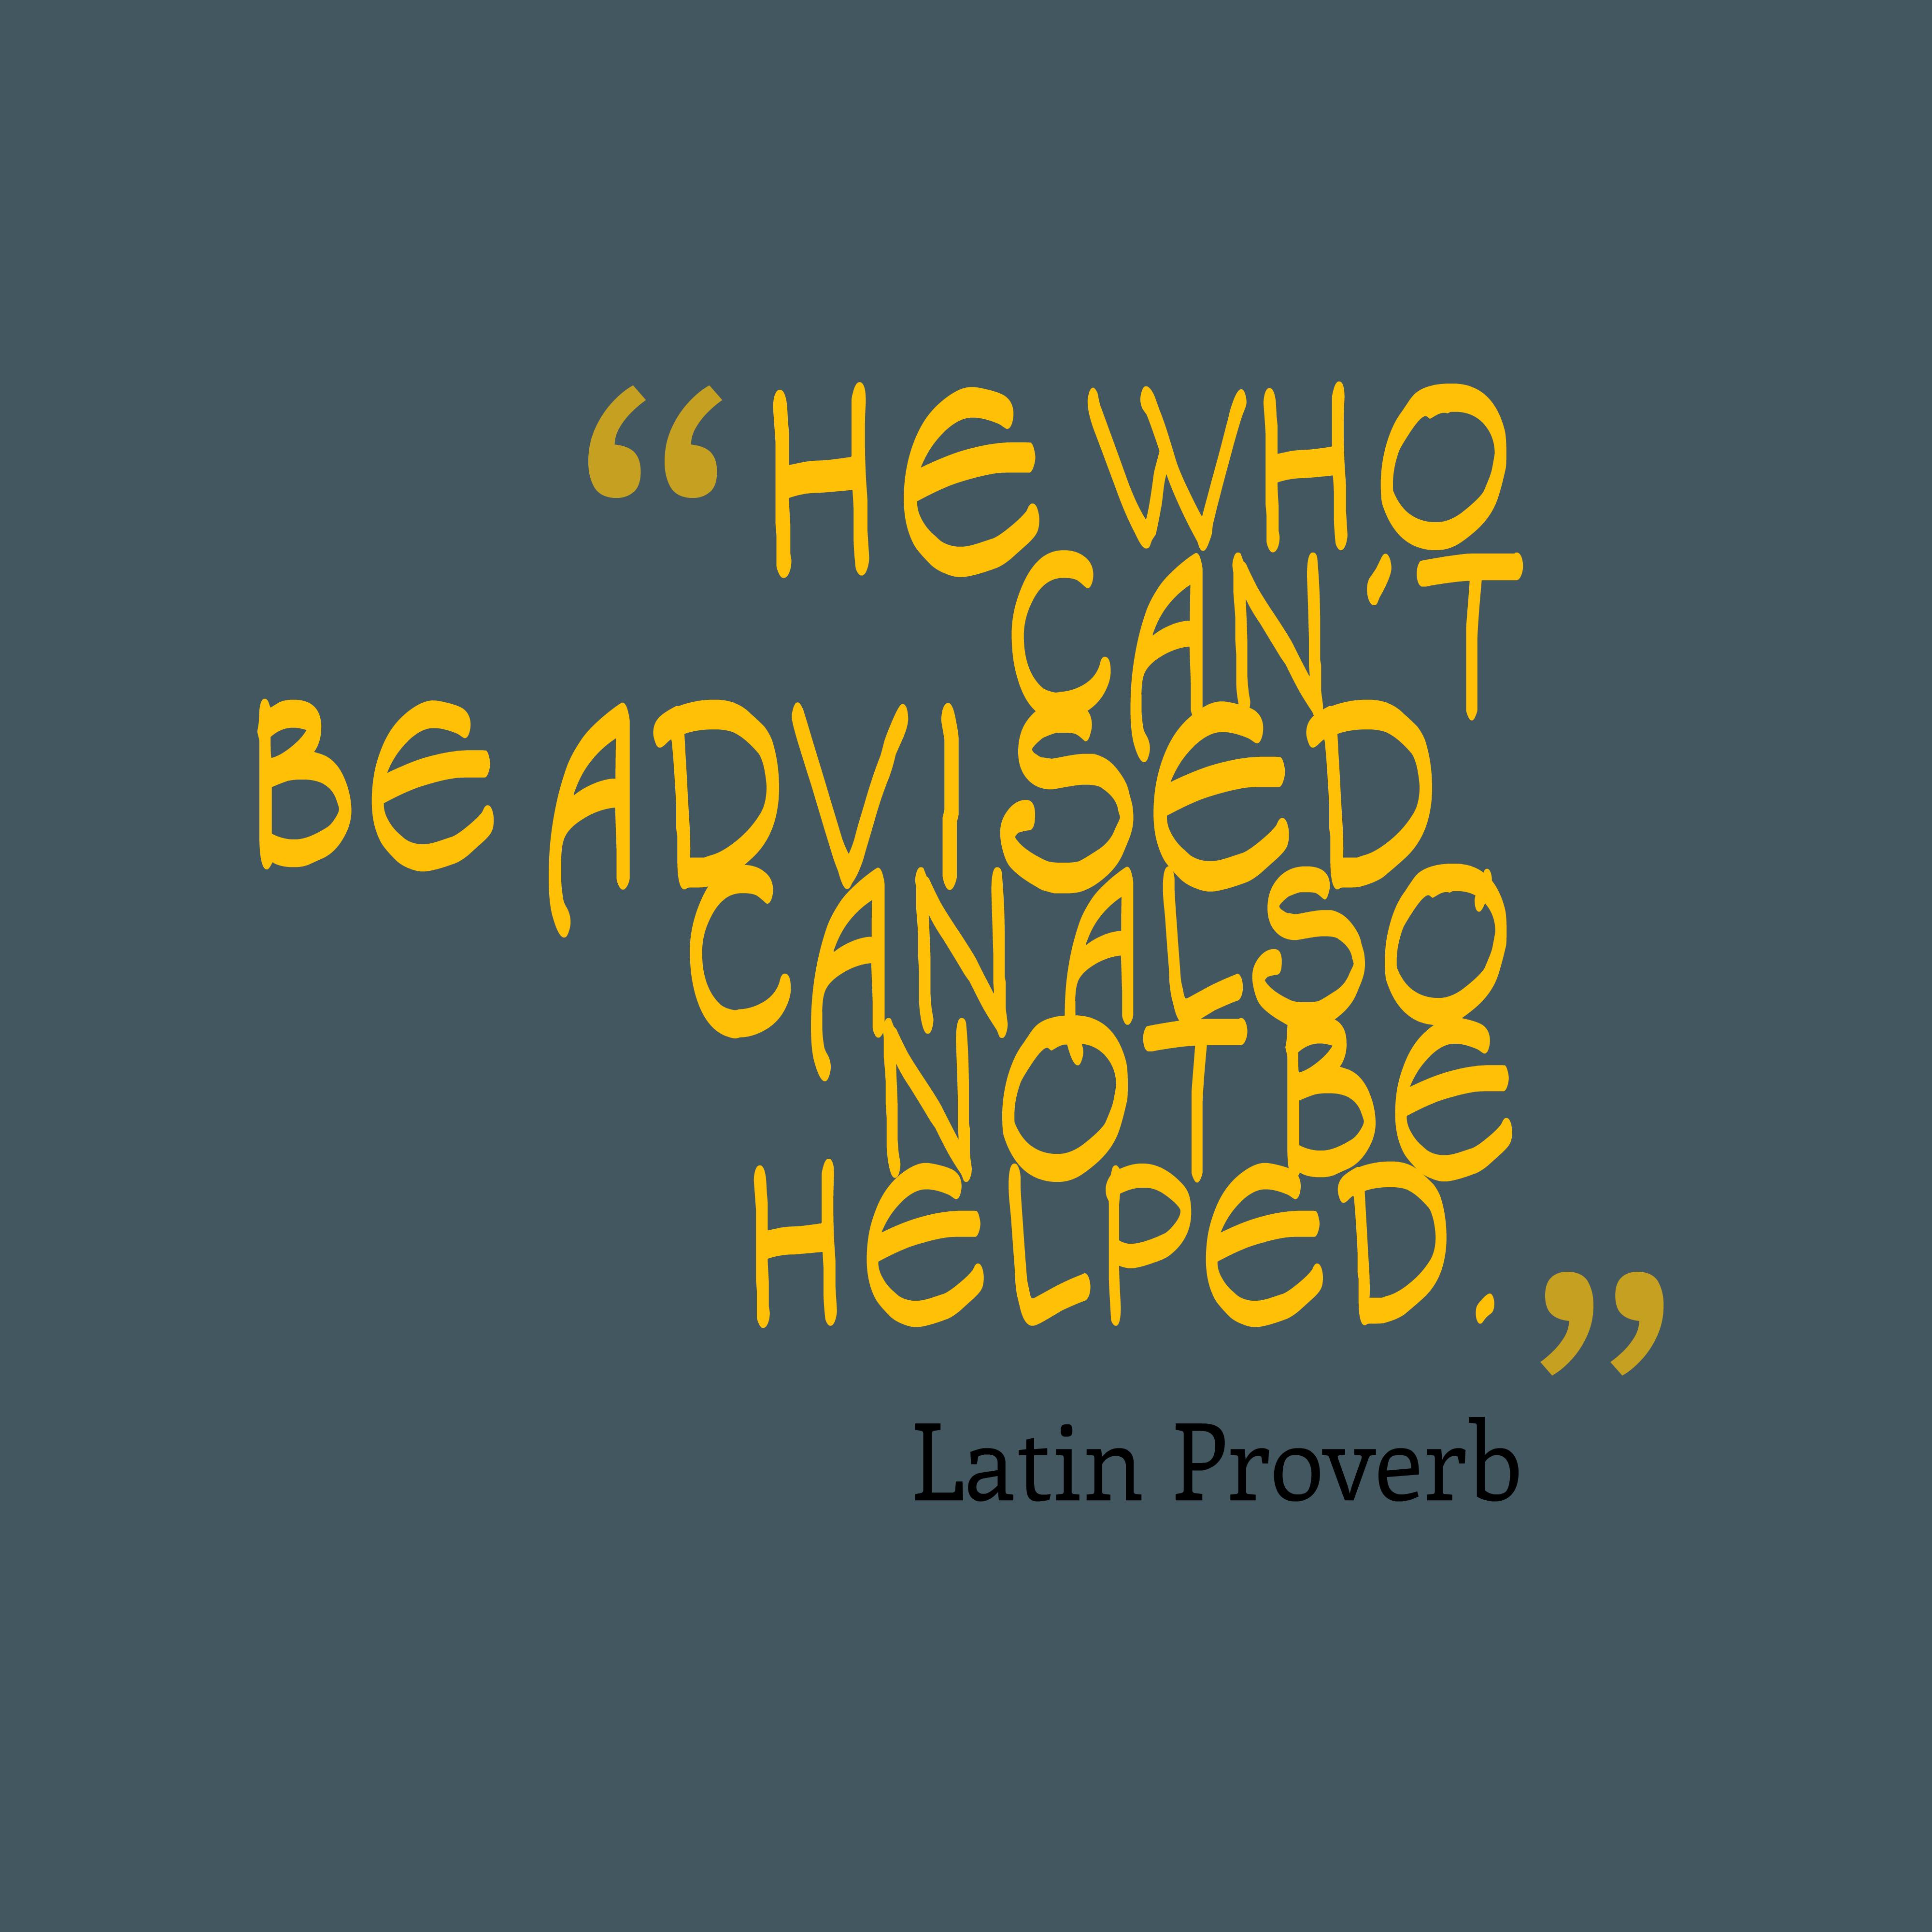 Latin Wisdom About Advertises: Latin Wisdom About Advice